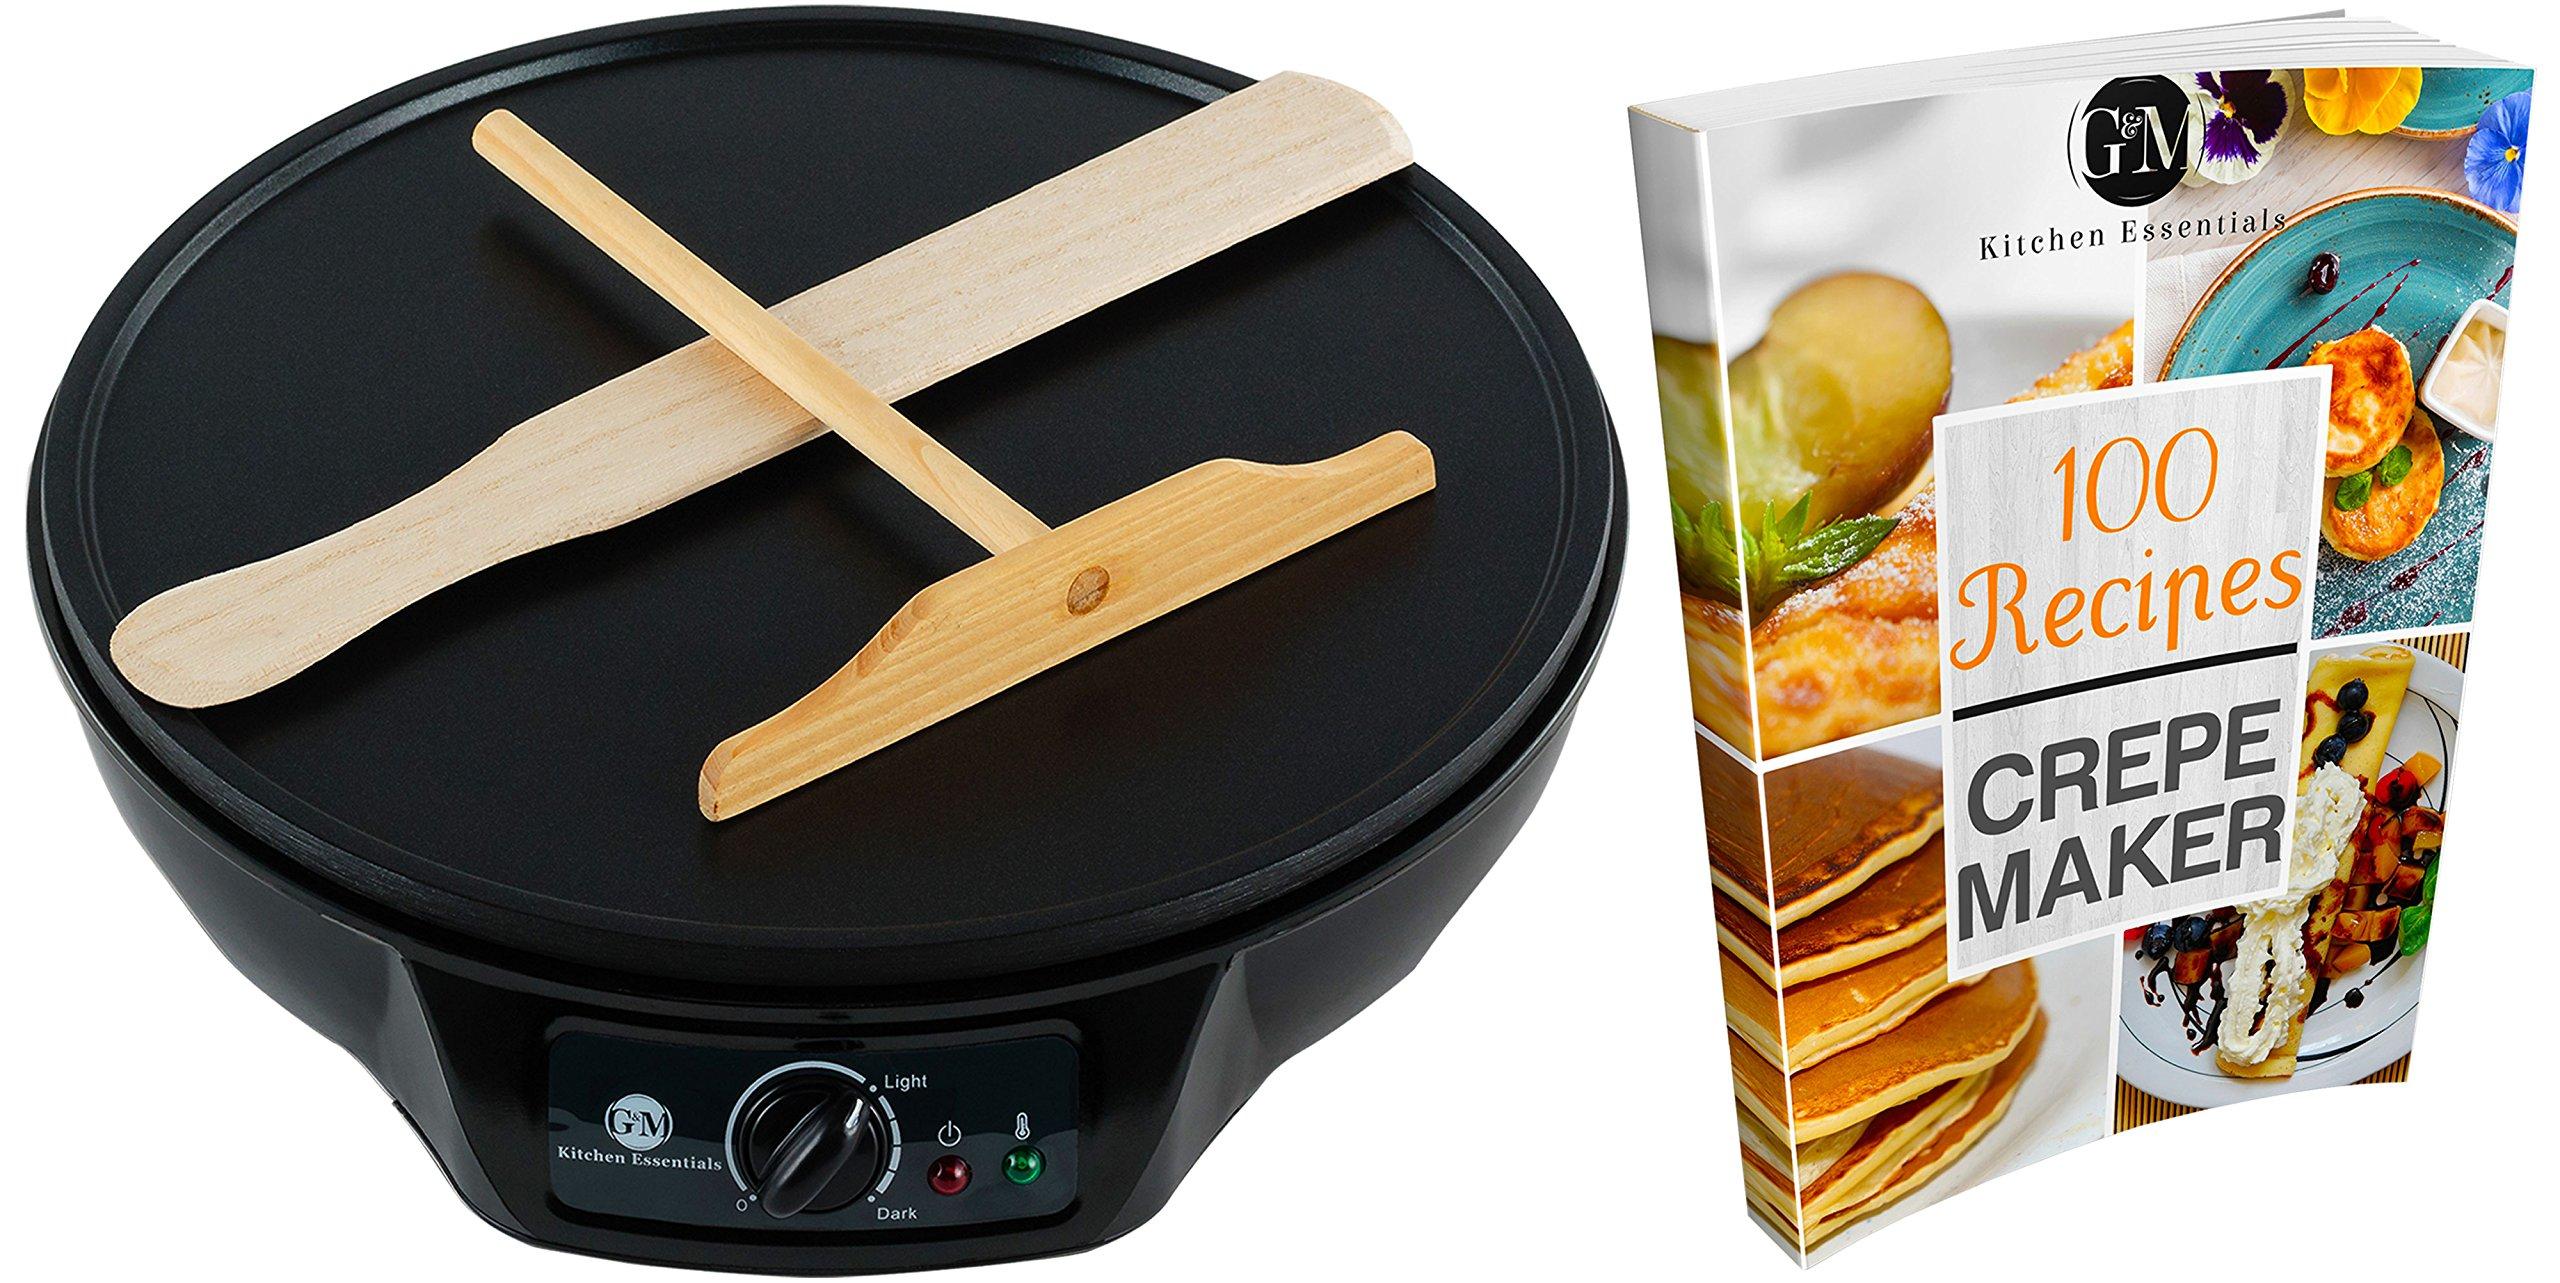 "Professional Crepe Maker Machine by G&M Kitchen Essentials – Non-Stick 12"" Electric Pancake Griddle –Adjustable Temperature Dial – BONUS 100 RECIPE E-COOKBOOK, Batter Spreader & Wooden Spatula"